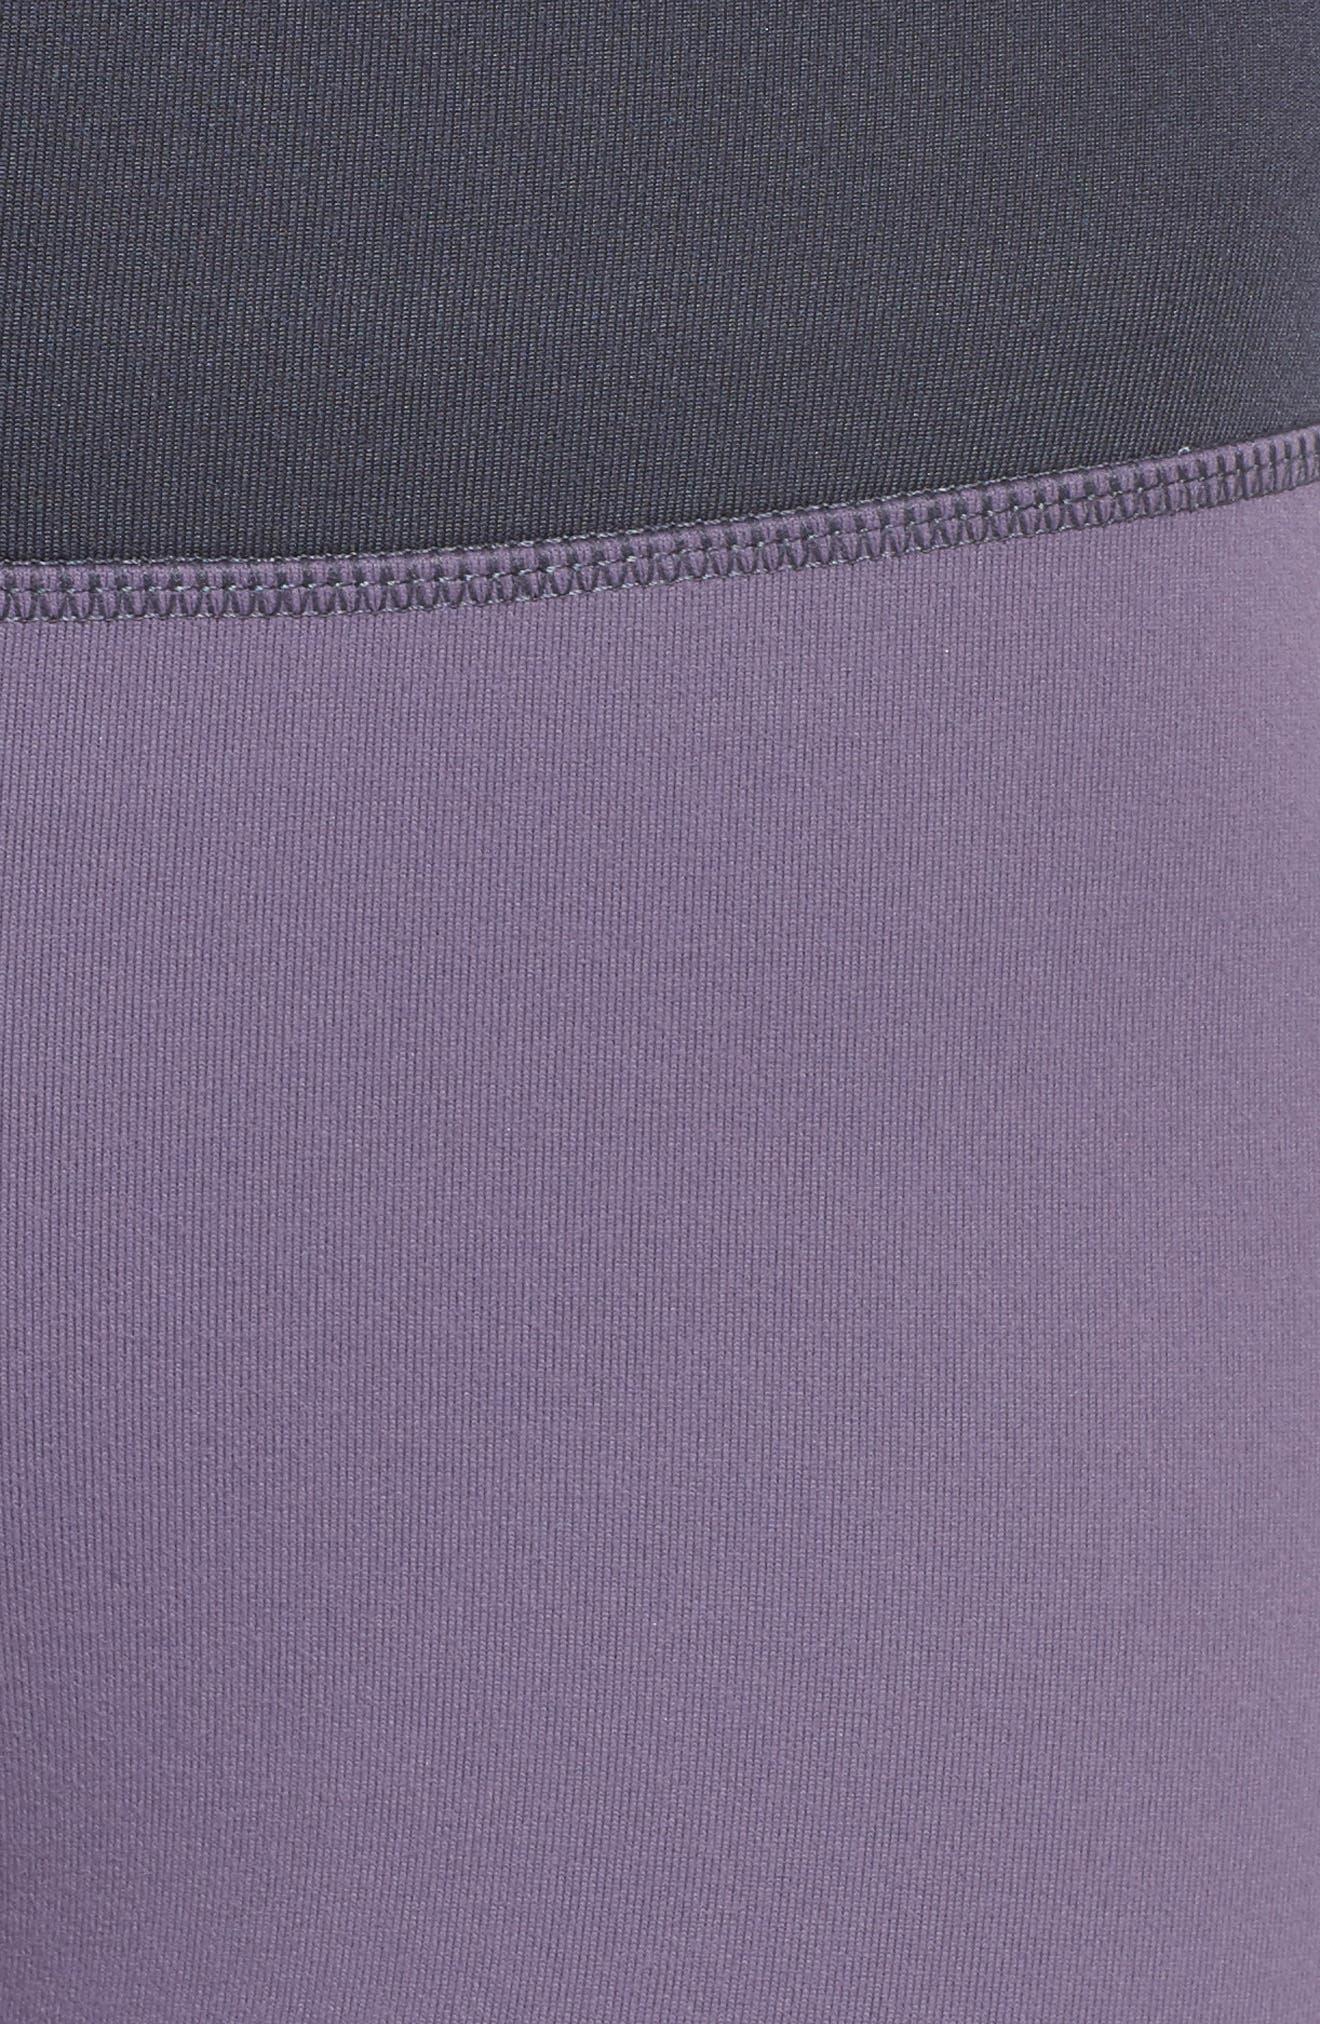 Around the Block High Waist Ankle Leggings,                             Alternate thumbnail 6, color,                             Purple Cadet